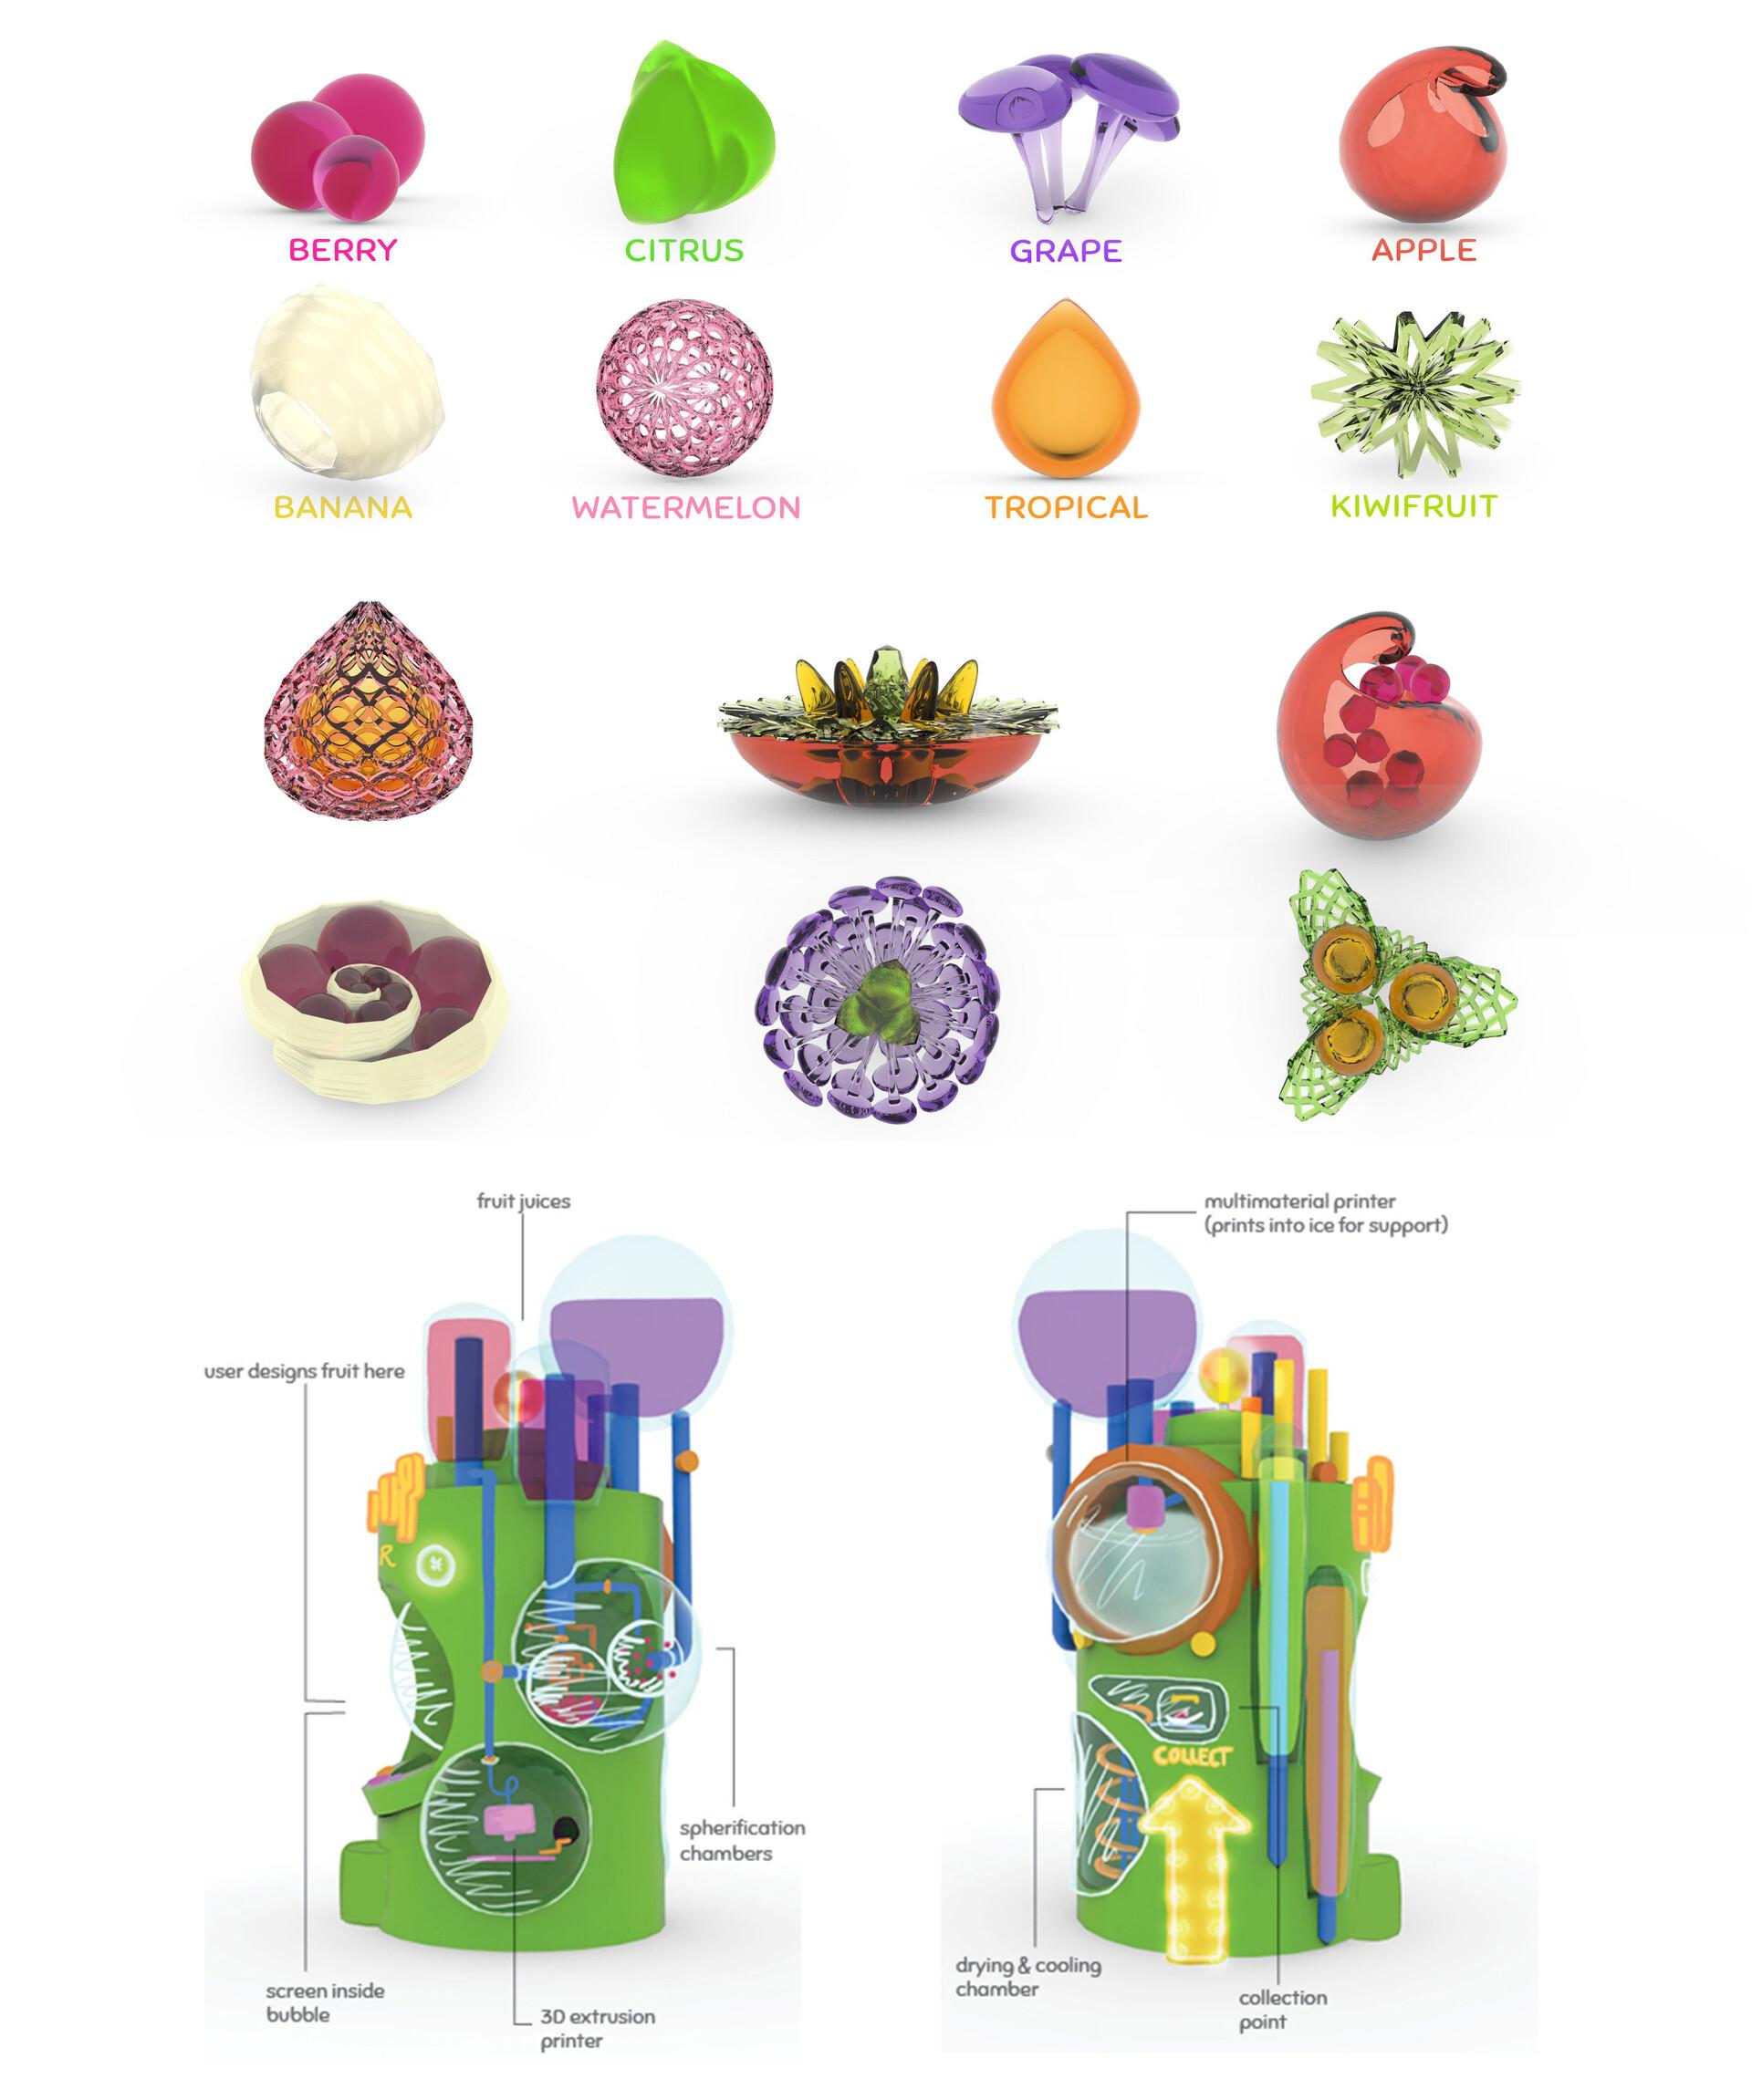 Tor robinson fruitsystem